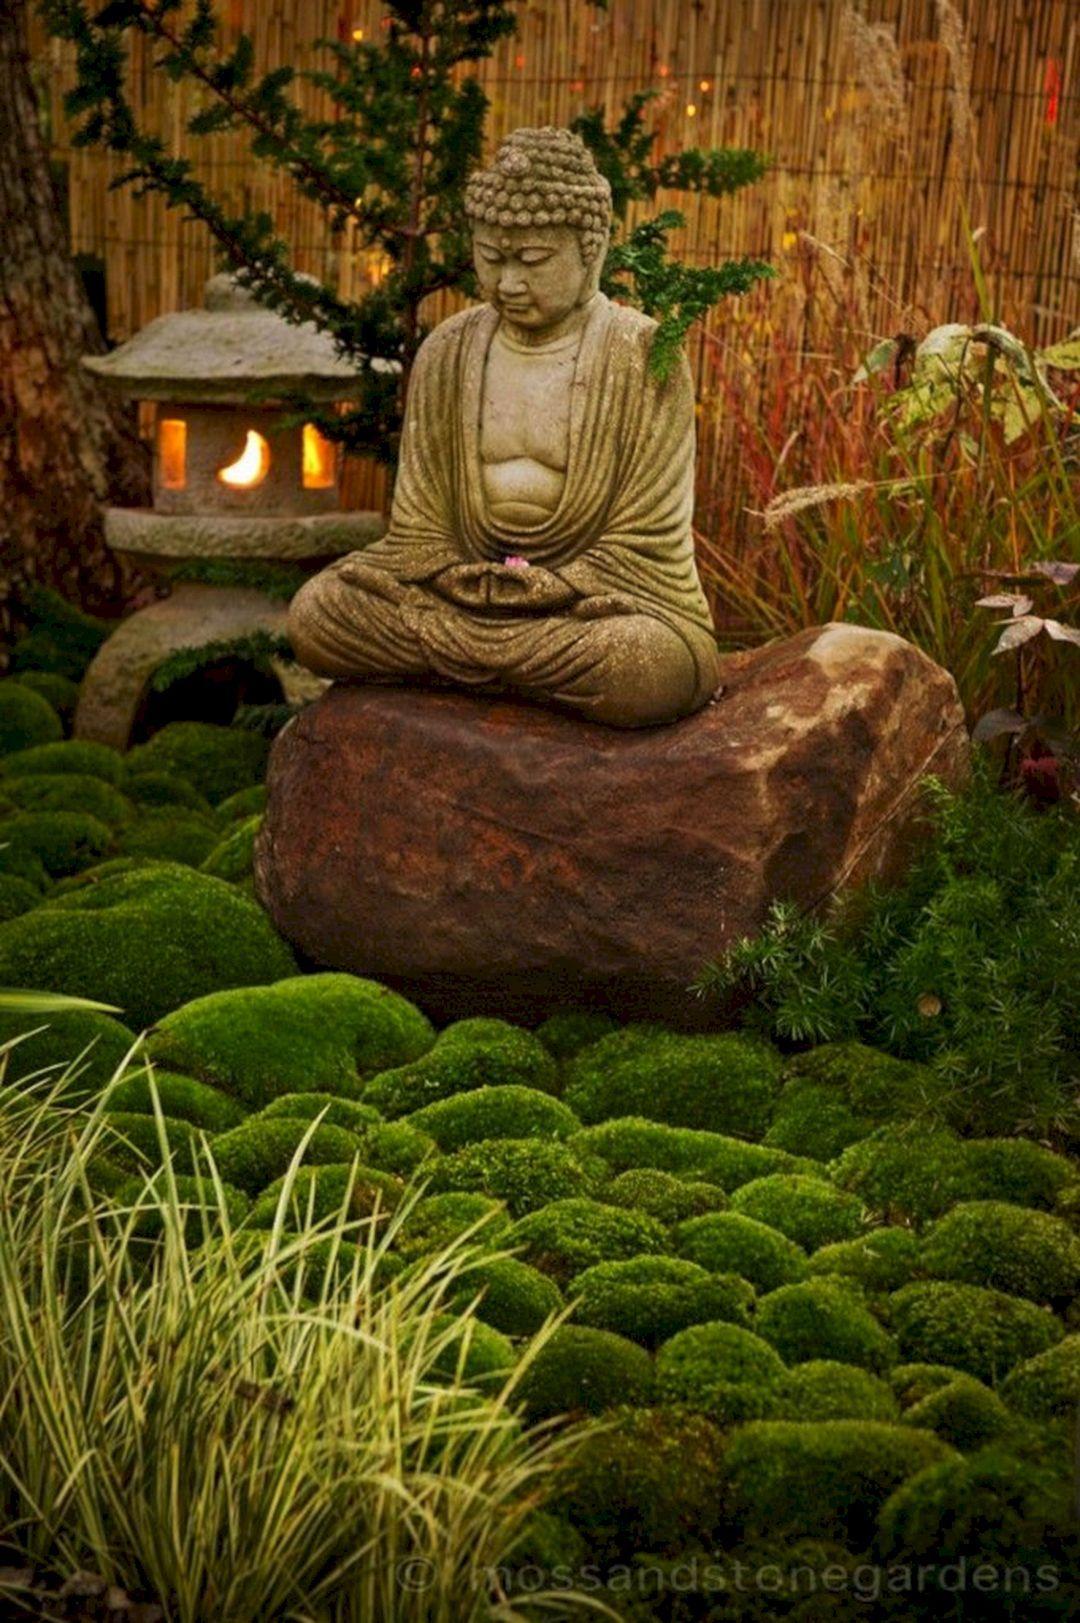 35 Awesome Buddha Garden Design Ideas For Calm Living Freshouz Com Buddha Garden Zen Garden Zen Garden Design